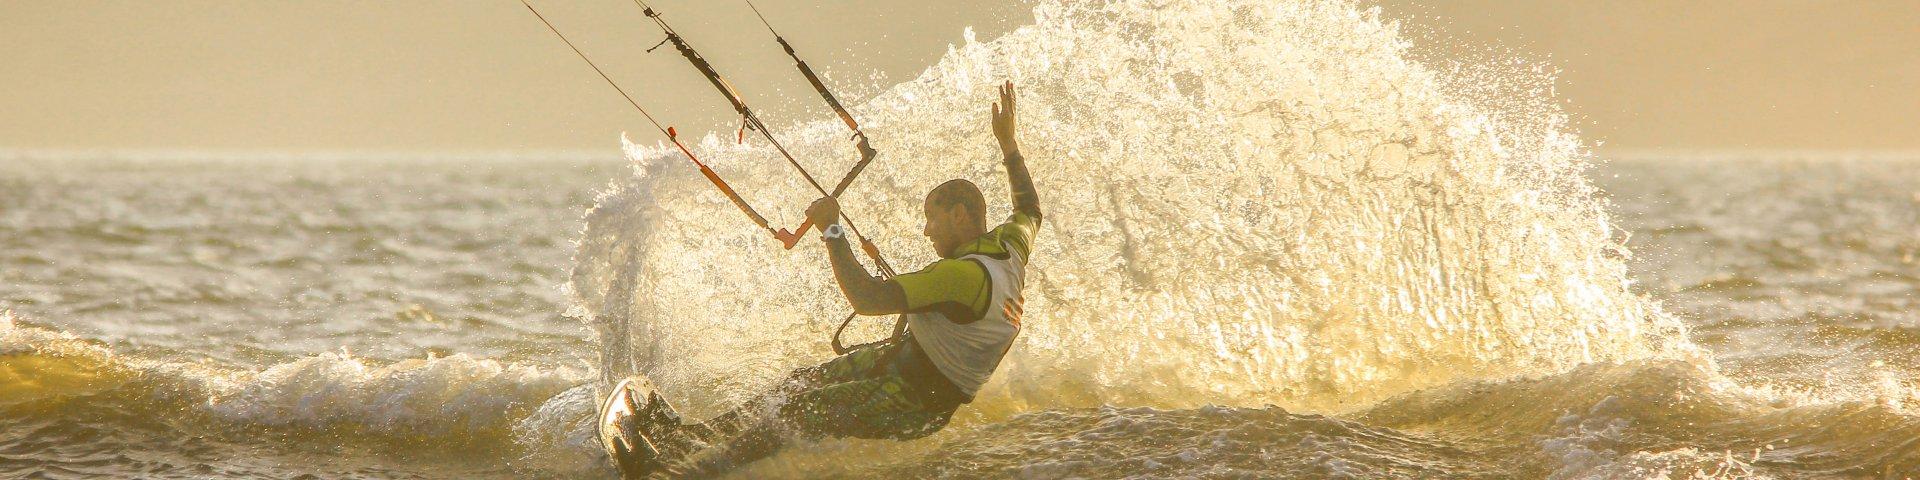 Kitesurf in Essaouira